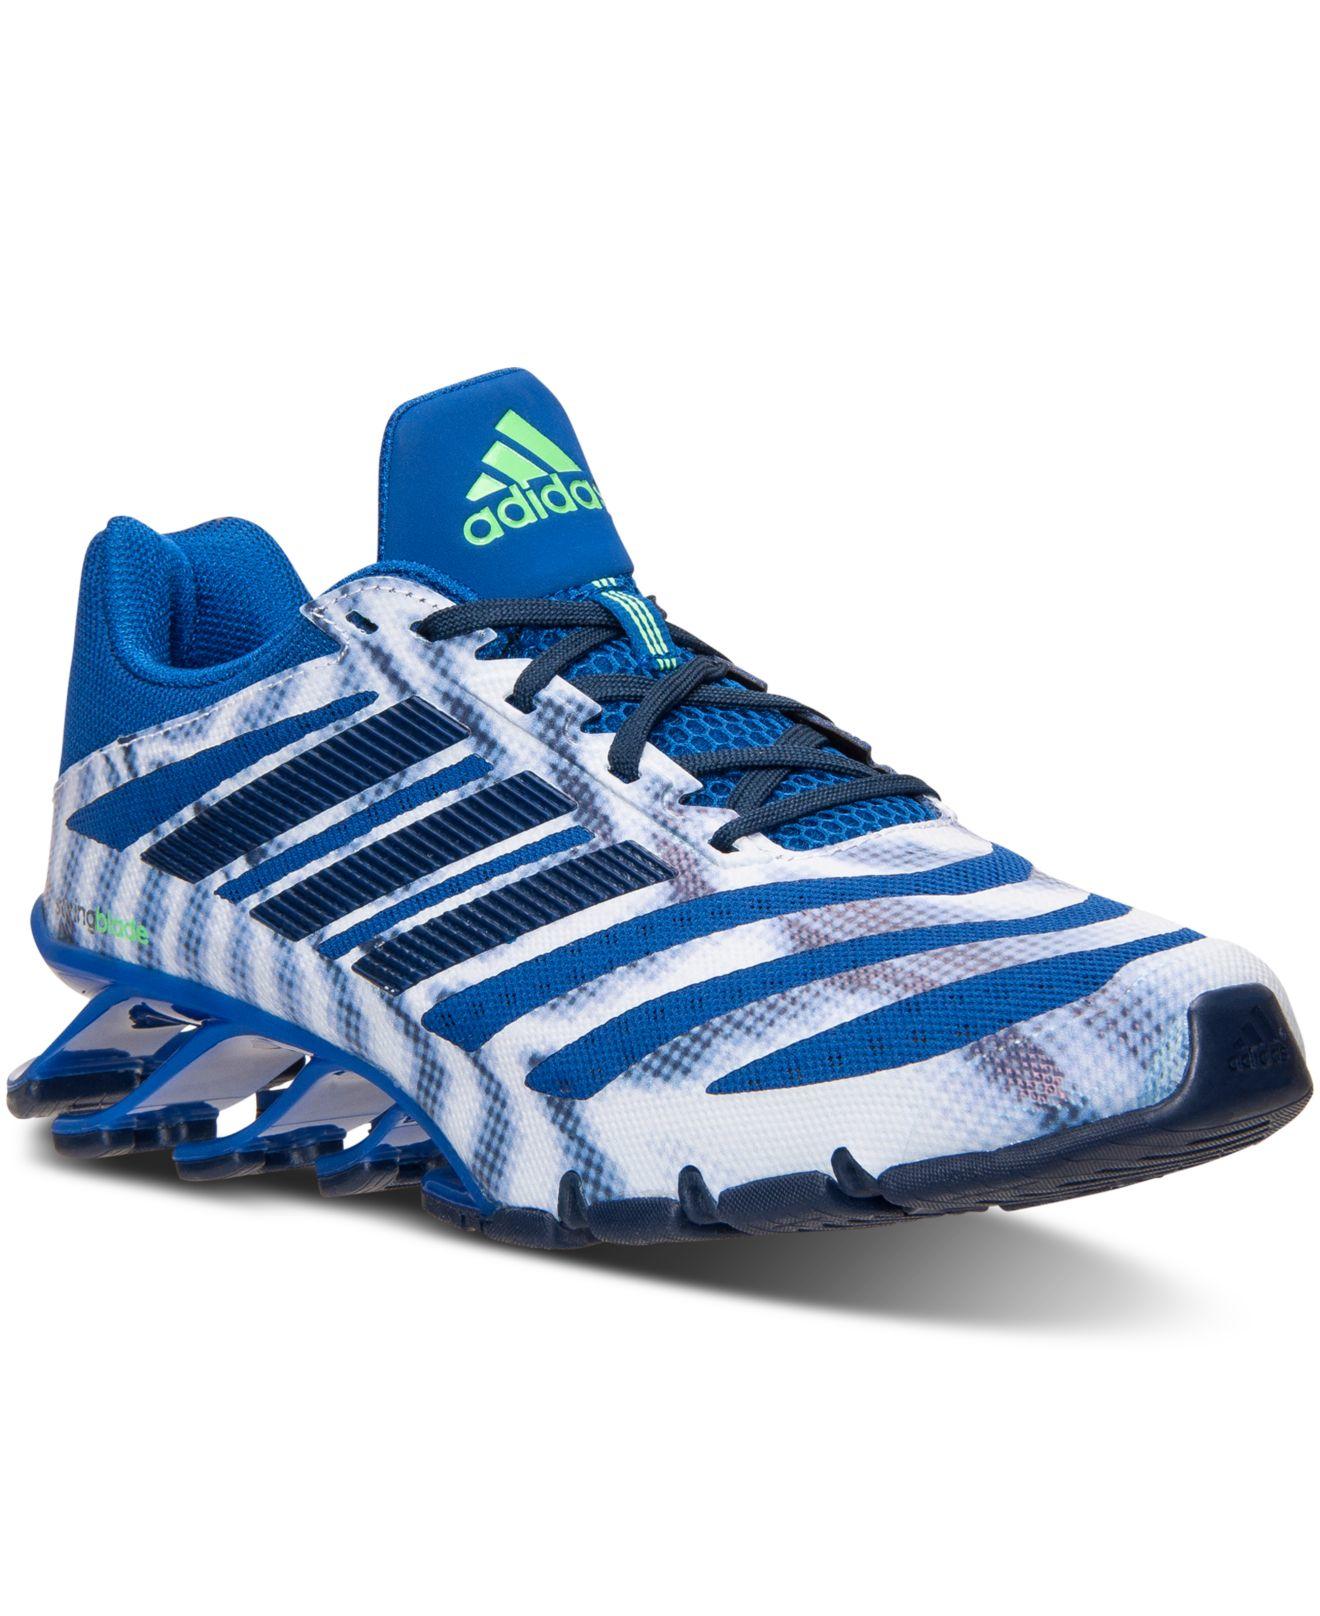 adidas springblade at finish line nz